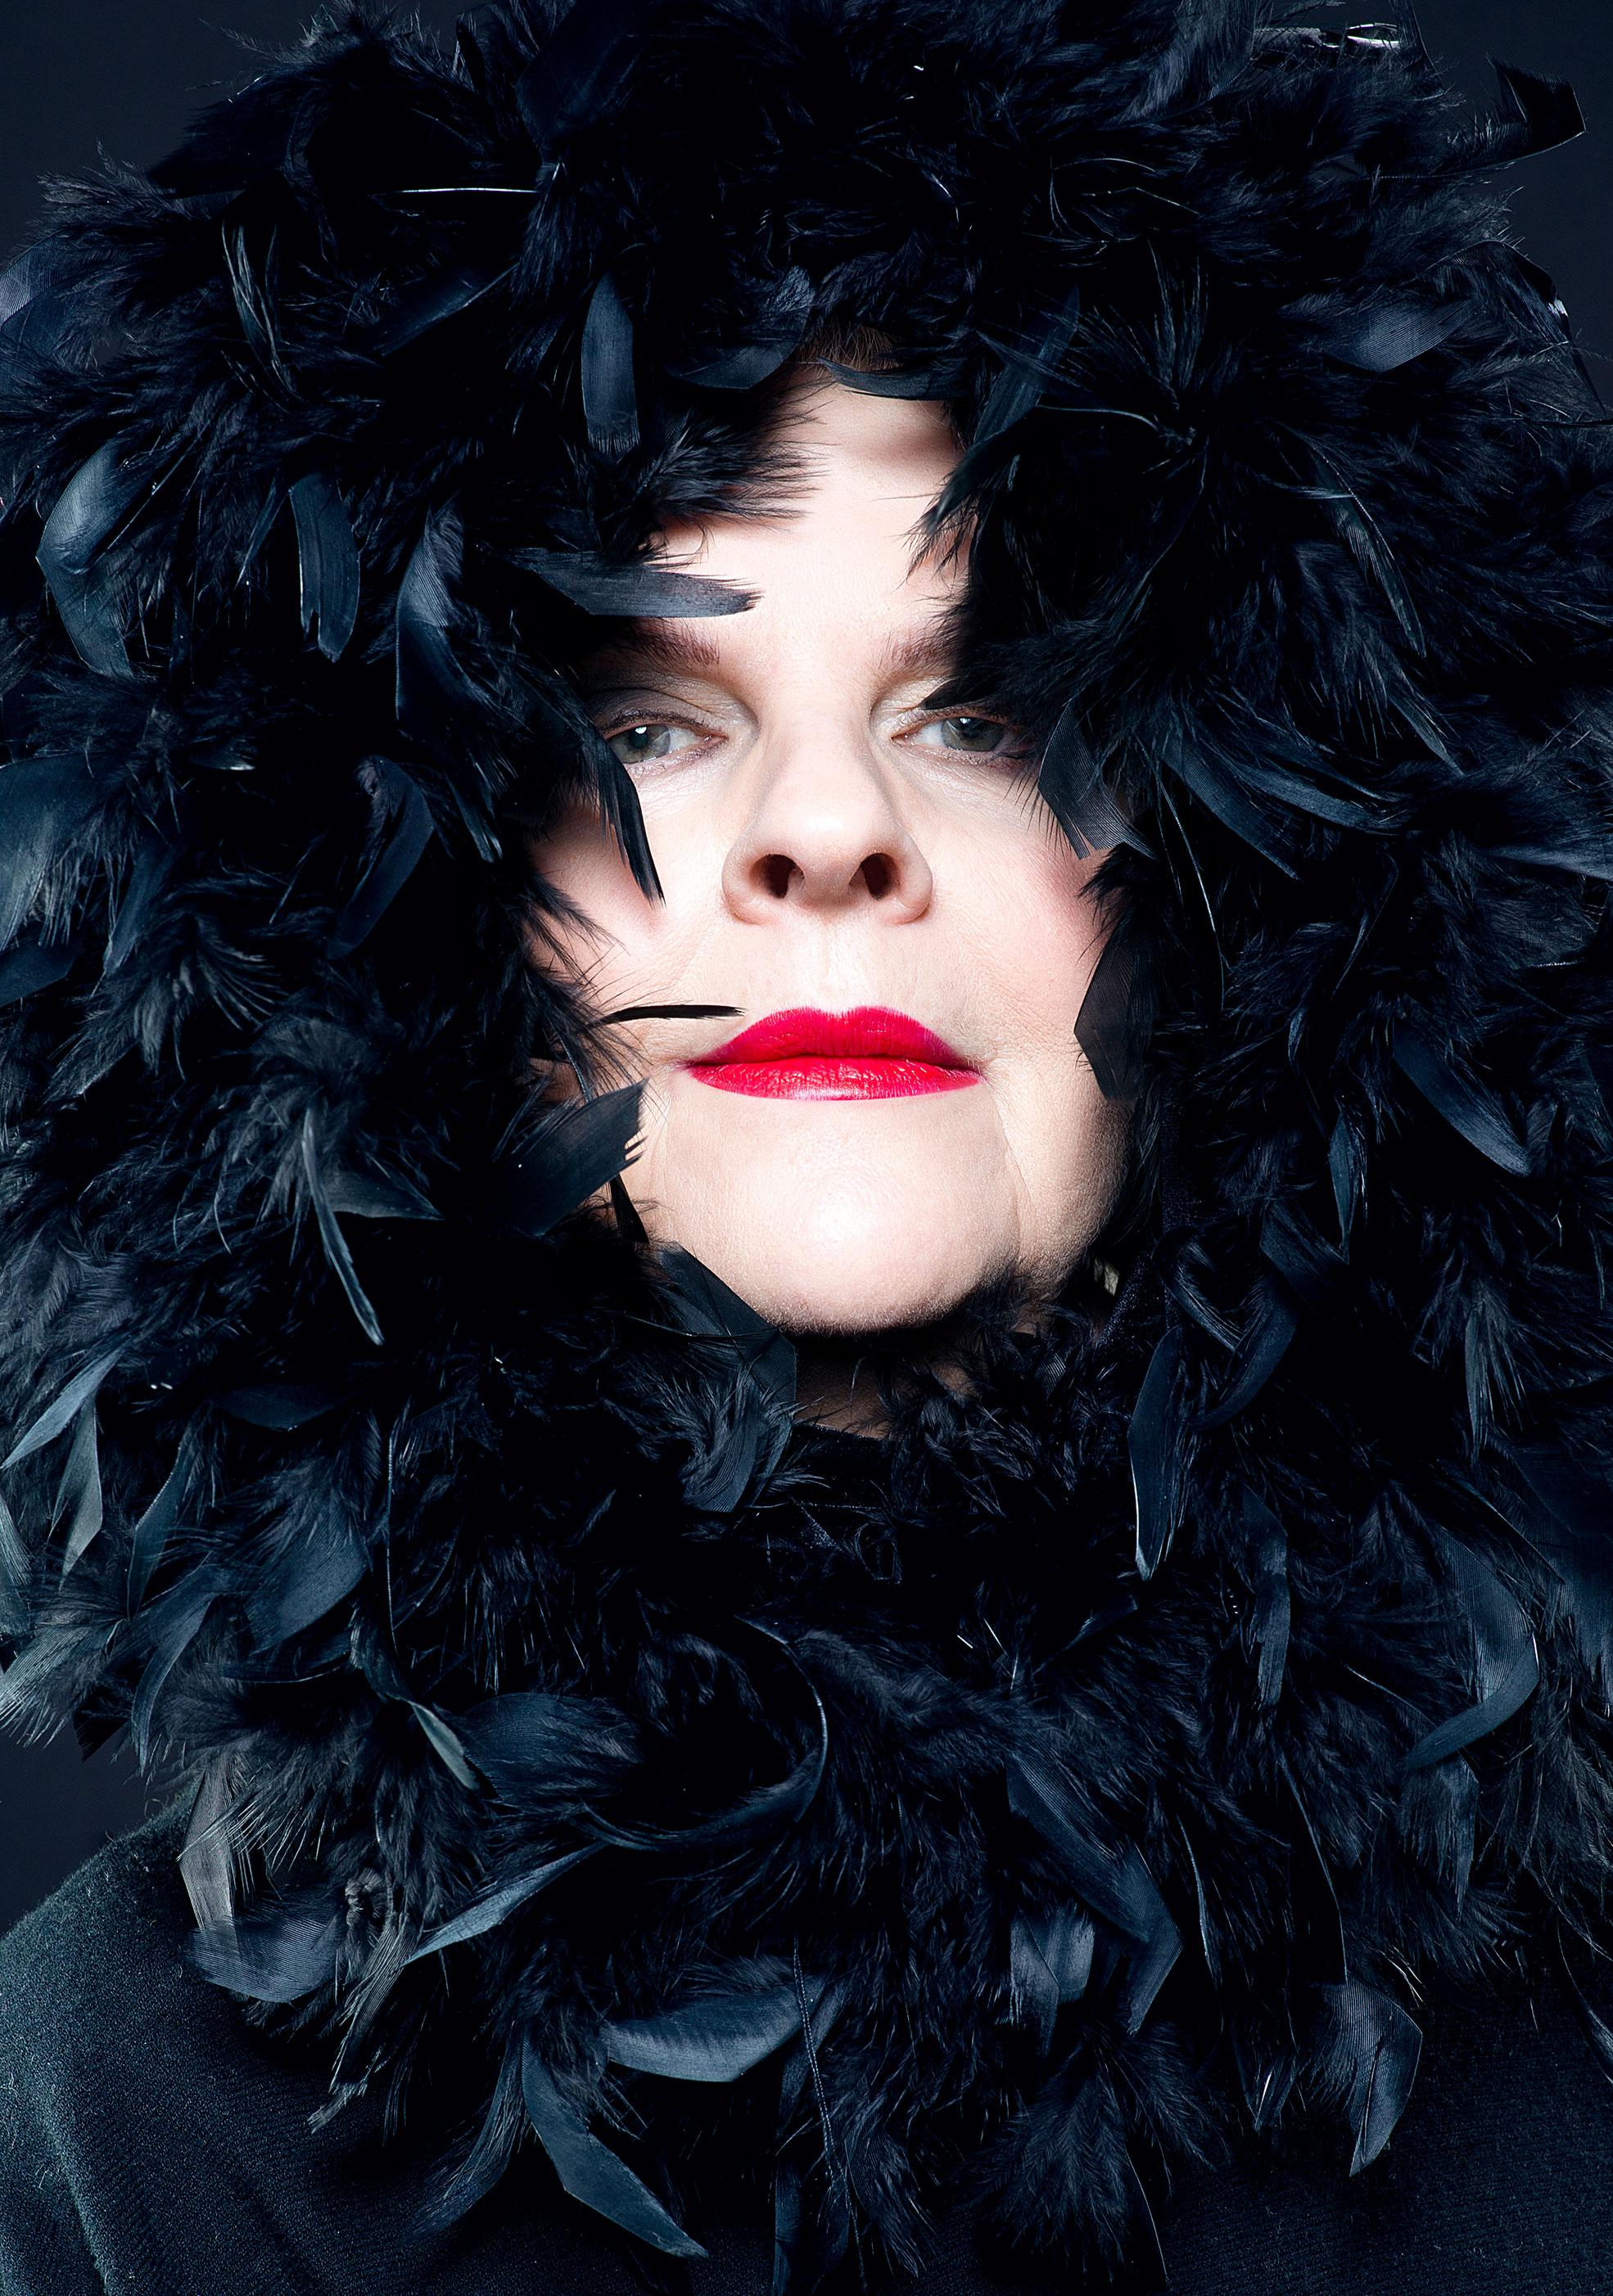 Portrait of an elderly woman with dark plumage Make Up By Daniele Francolino Photographer Maria Teresa Furnari